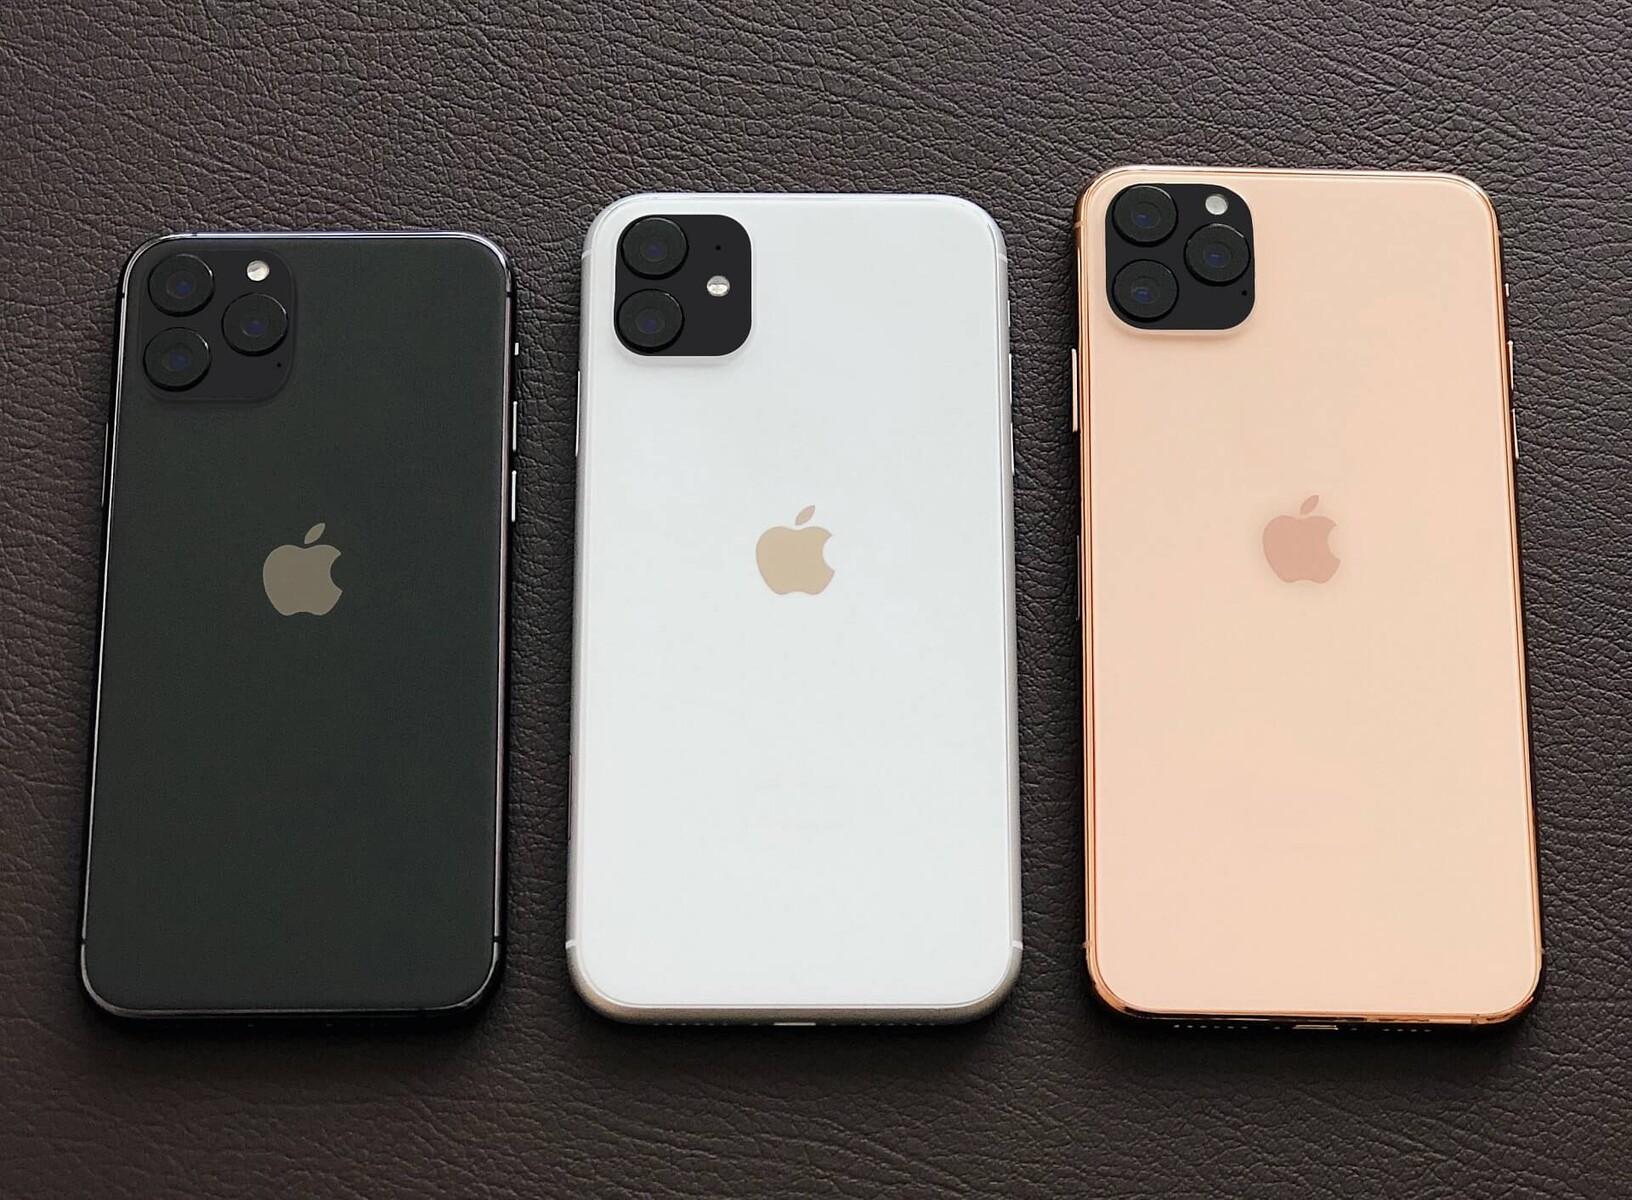 apple iphone 11 iphone 11 pro max alle specs finales. Black Bedroom Furniture Sets. Home Design Ideas